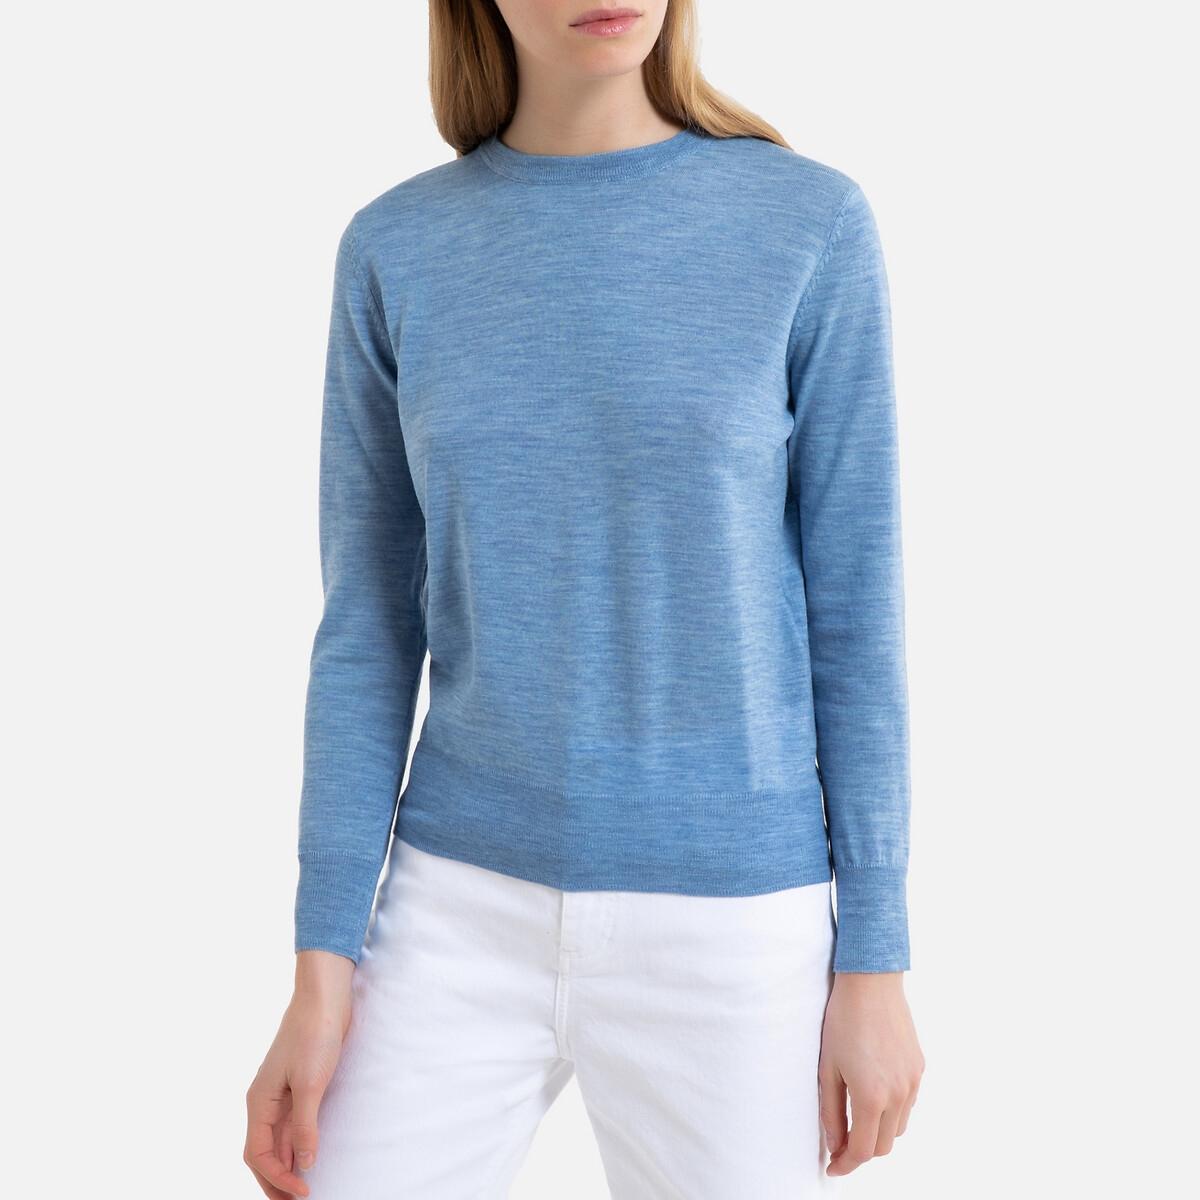 Пуловер La Redoute Из шерсти с круглым вырезом из тонкого трикотажа MARCELLO S синий пуловер la redoute из тонкого трикотажа со шнуровкой l бежевый